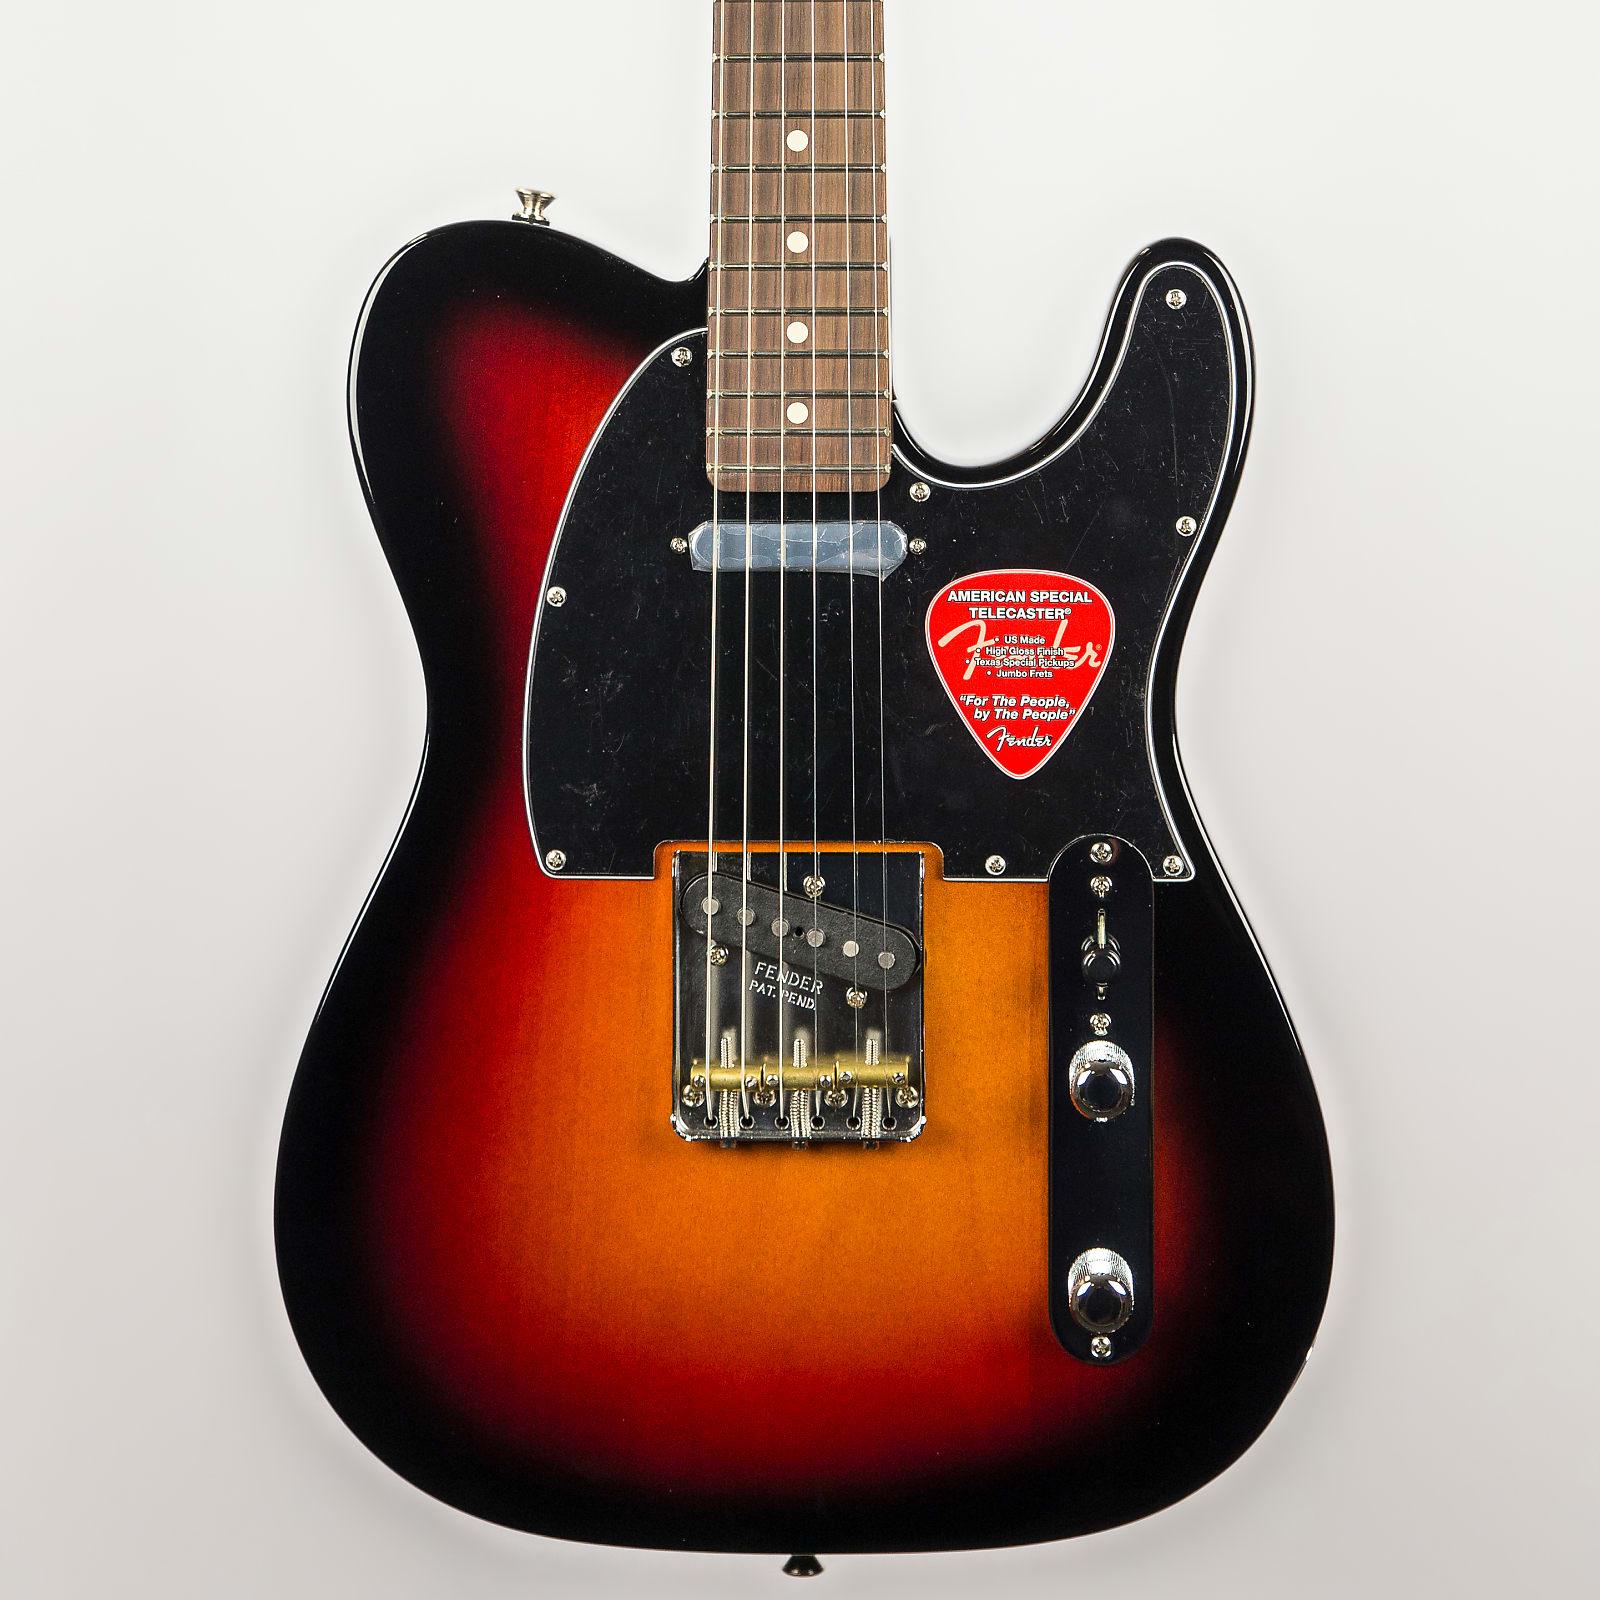 Fender American Special Telecaster In 3 Color Sunburst